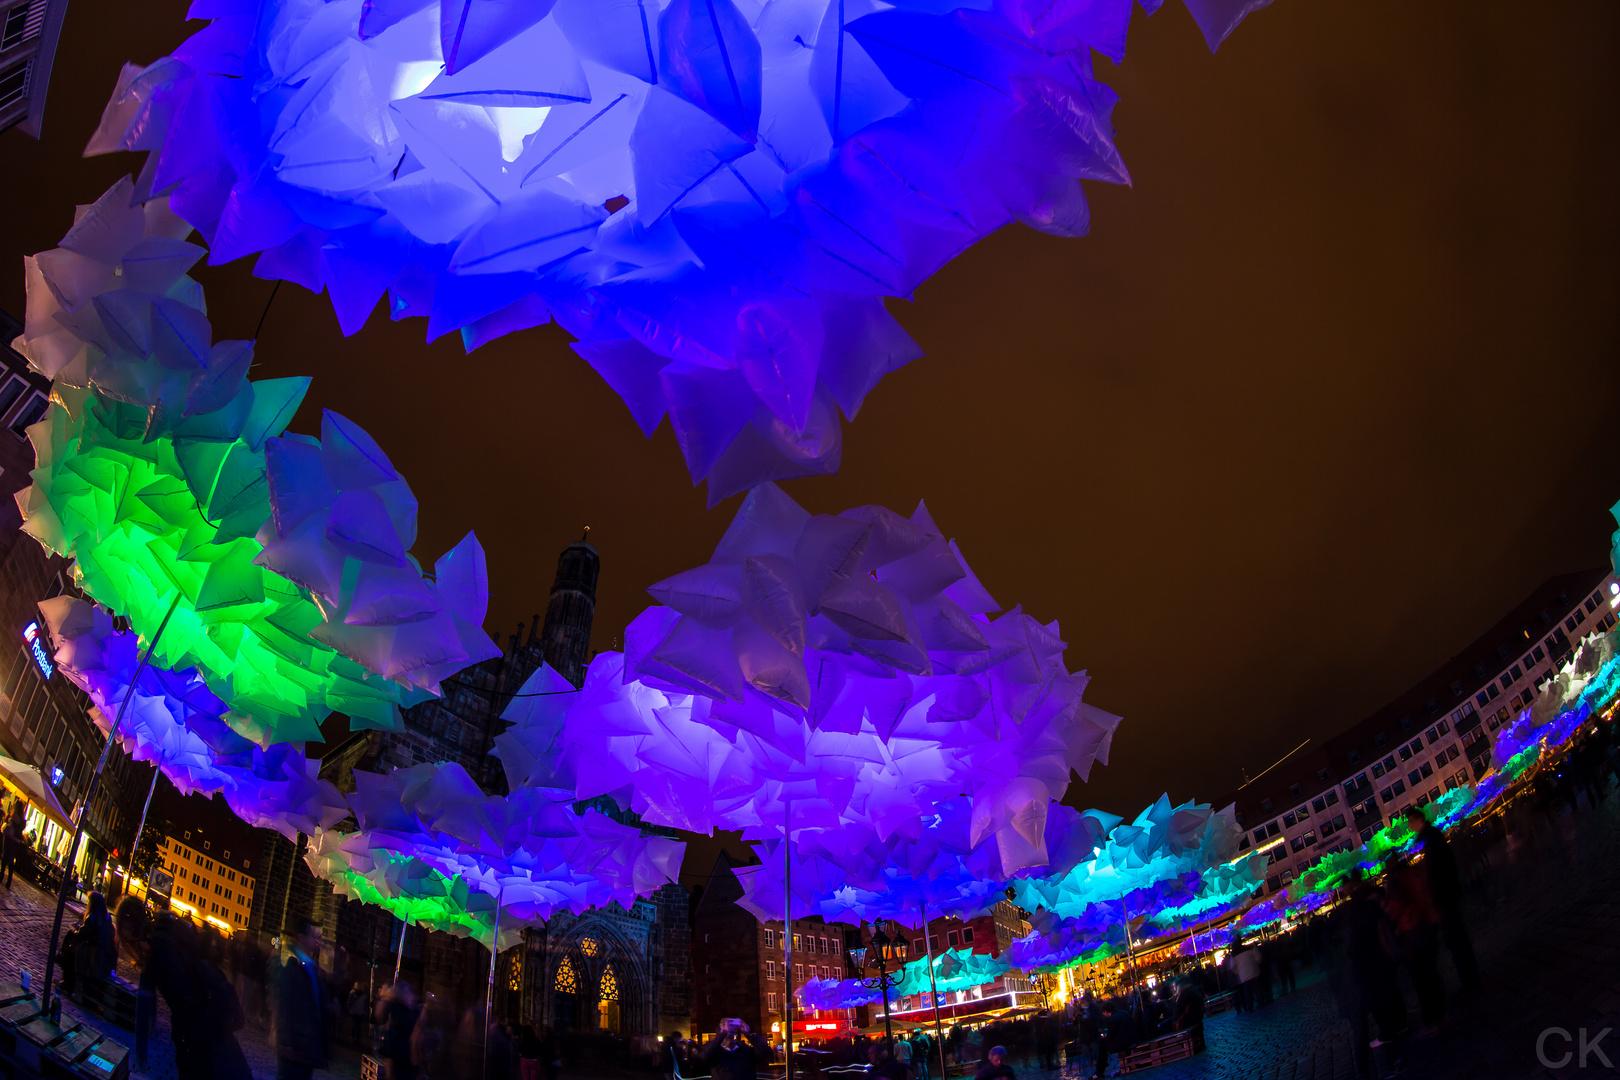 Blaue Nacht Nürnberg 2014: Hauptmarkt